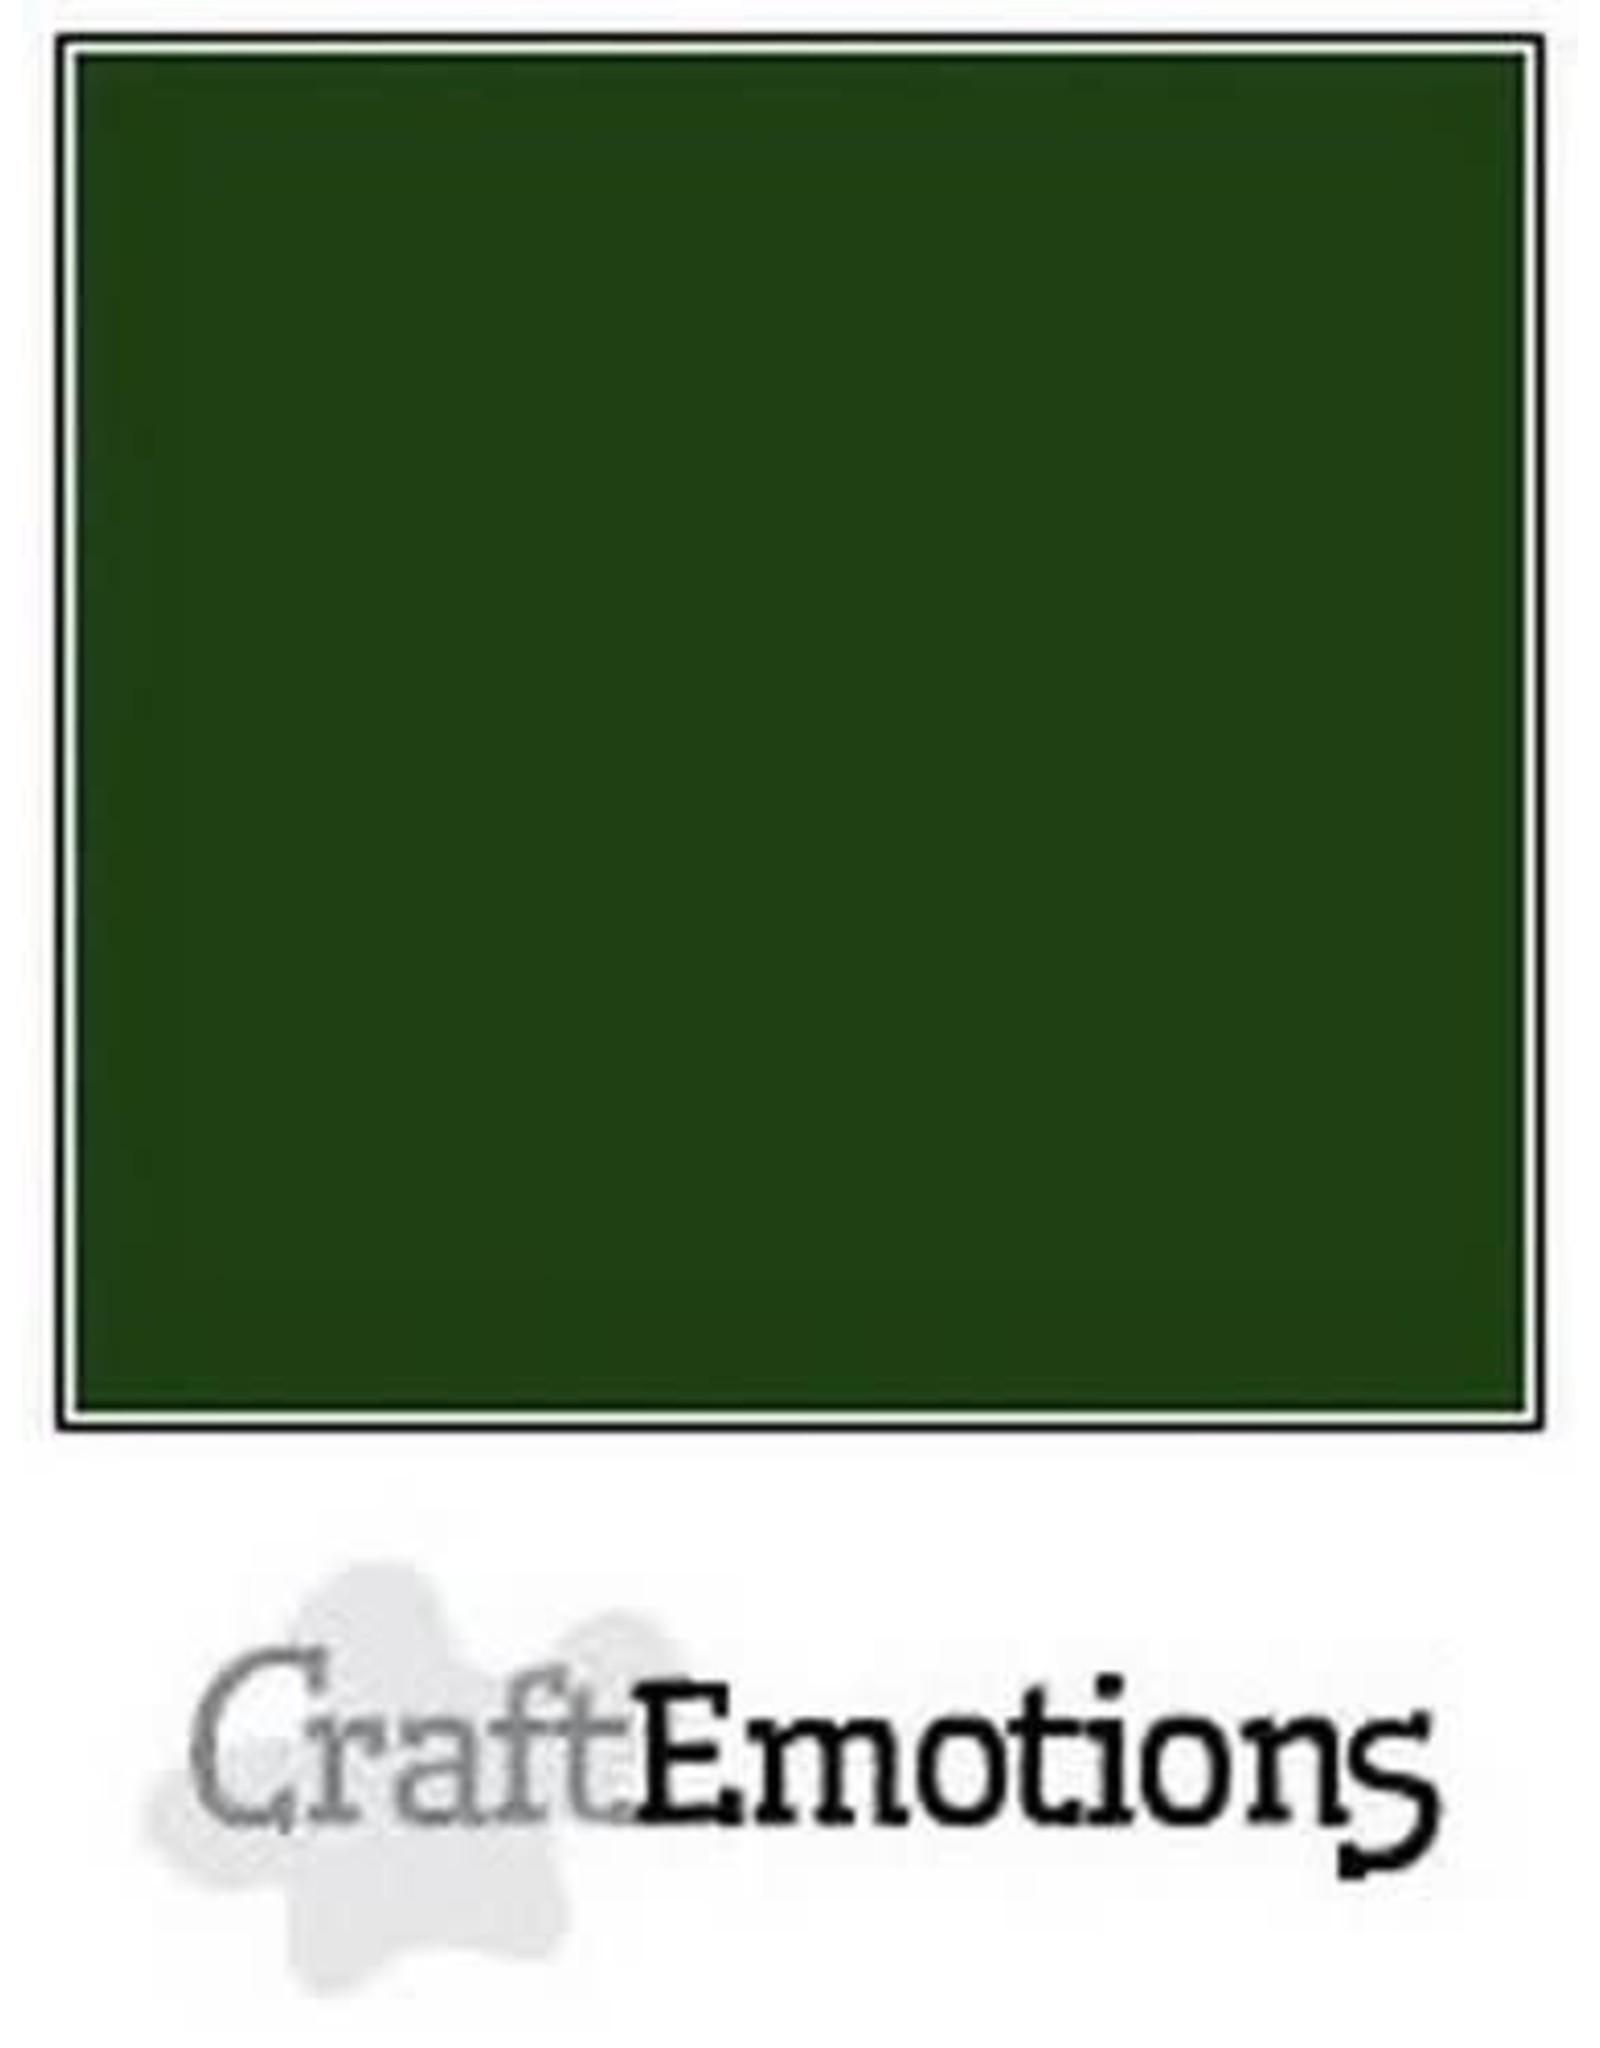 Craft Emotions CraftEmotions karton gladkarton  smaragdgroen 30,0x30,0cm 250gr